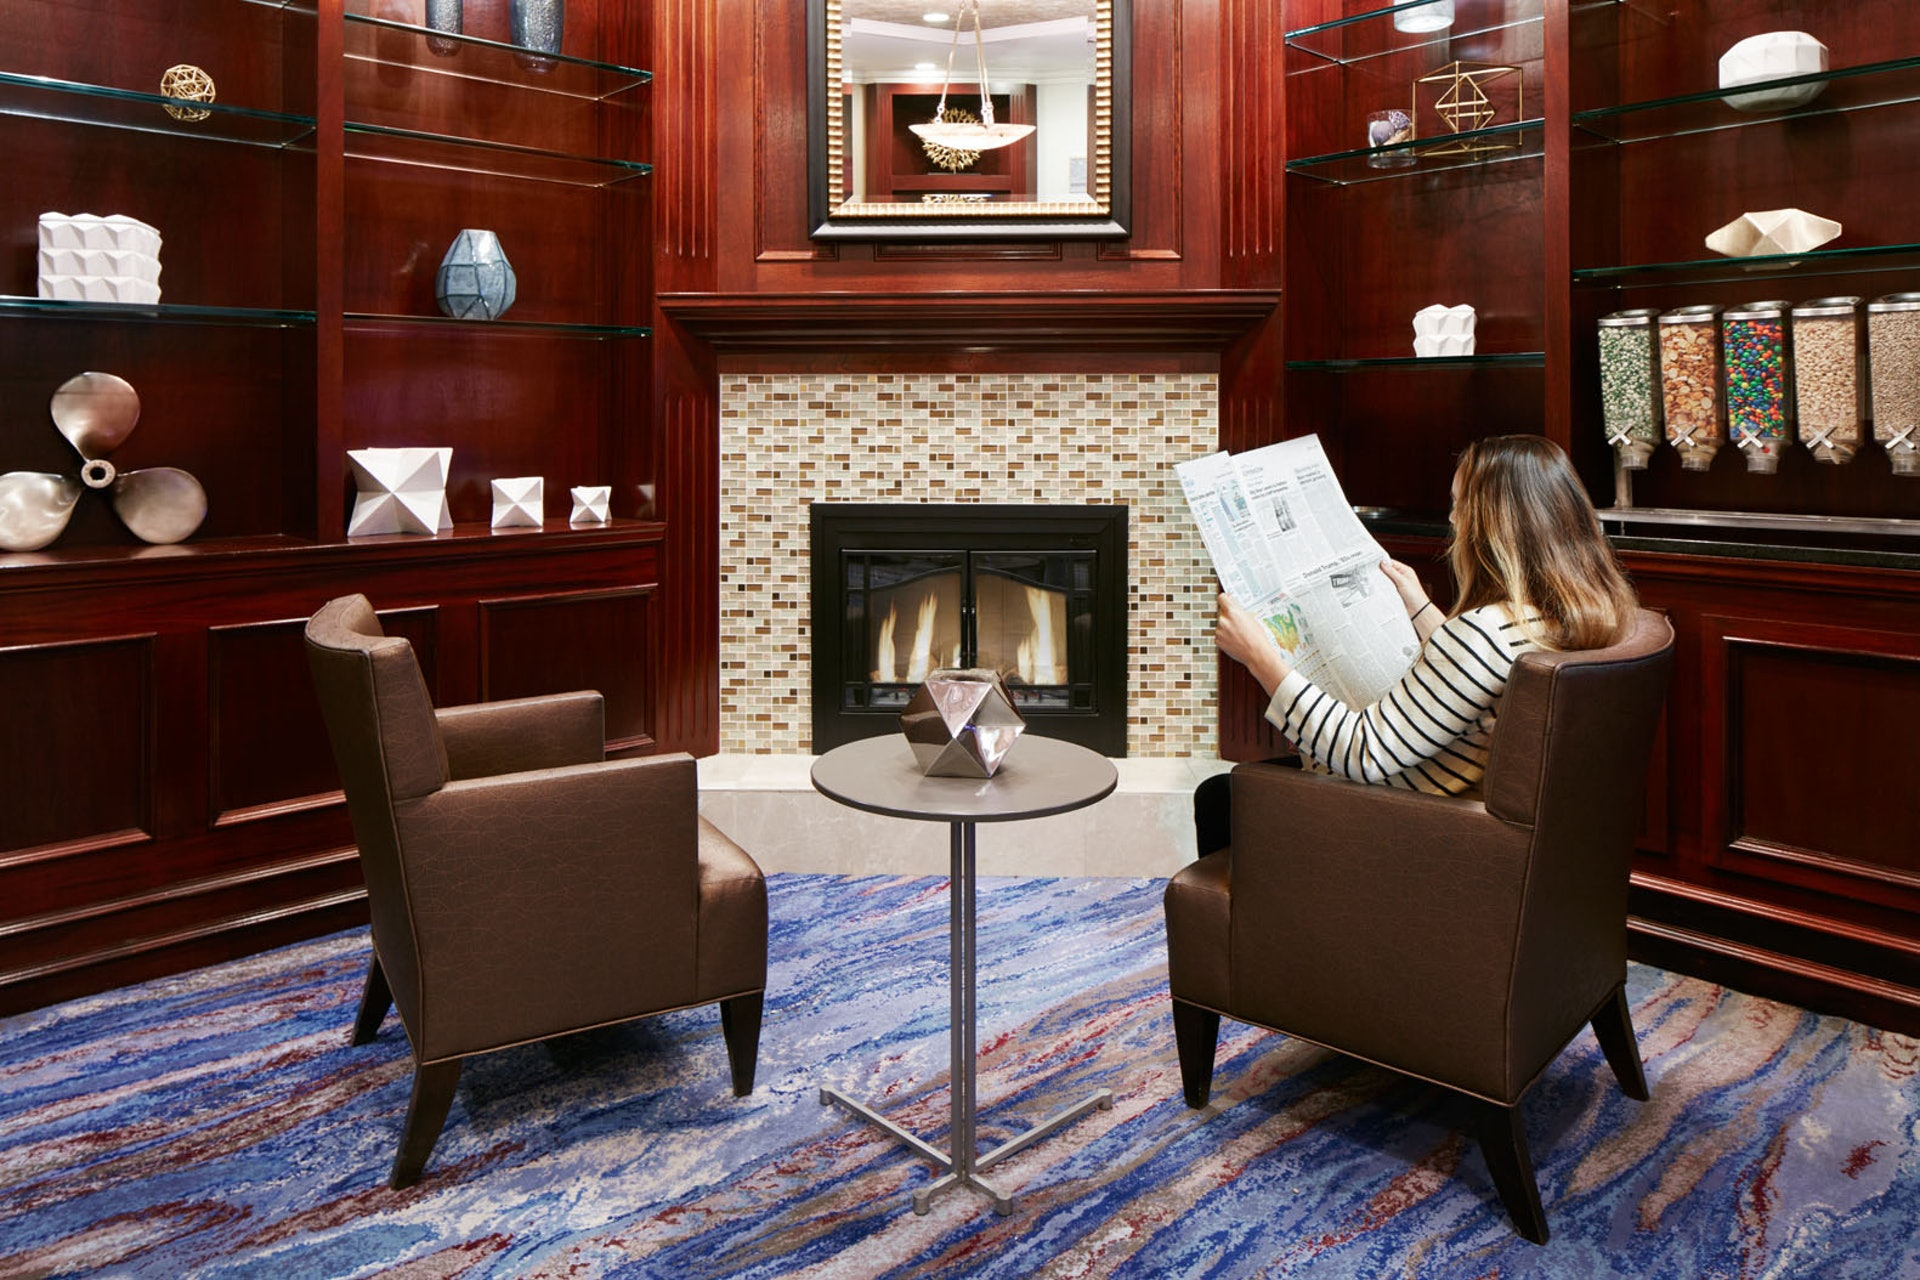 Club Living Room at Club Quarters Hotel in Boston